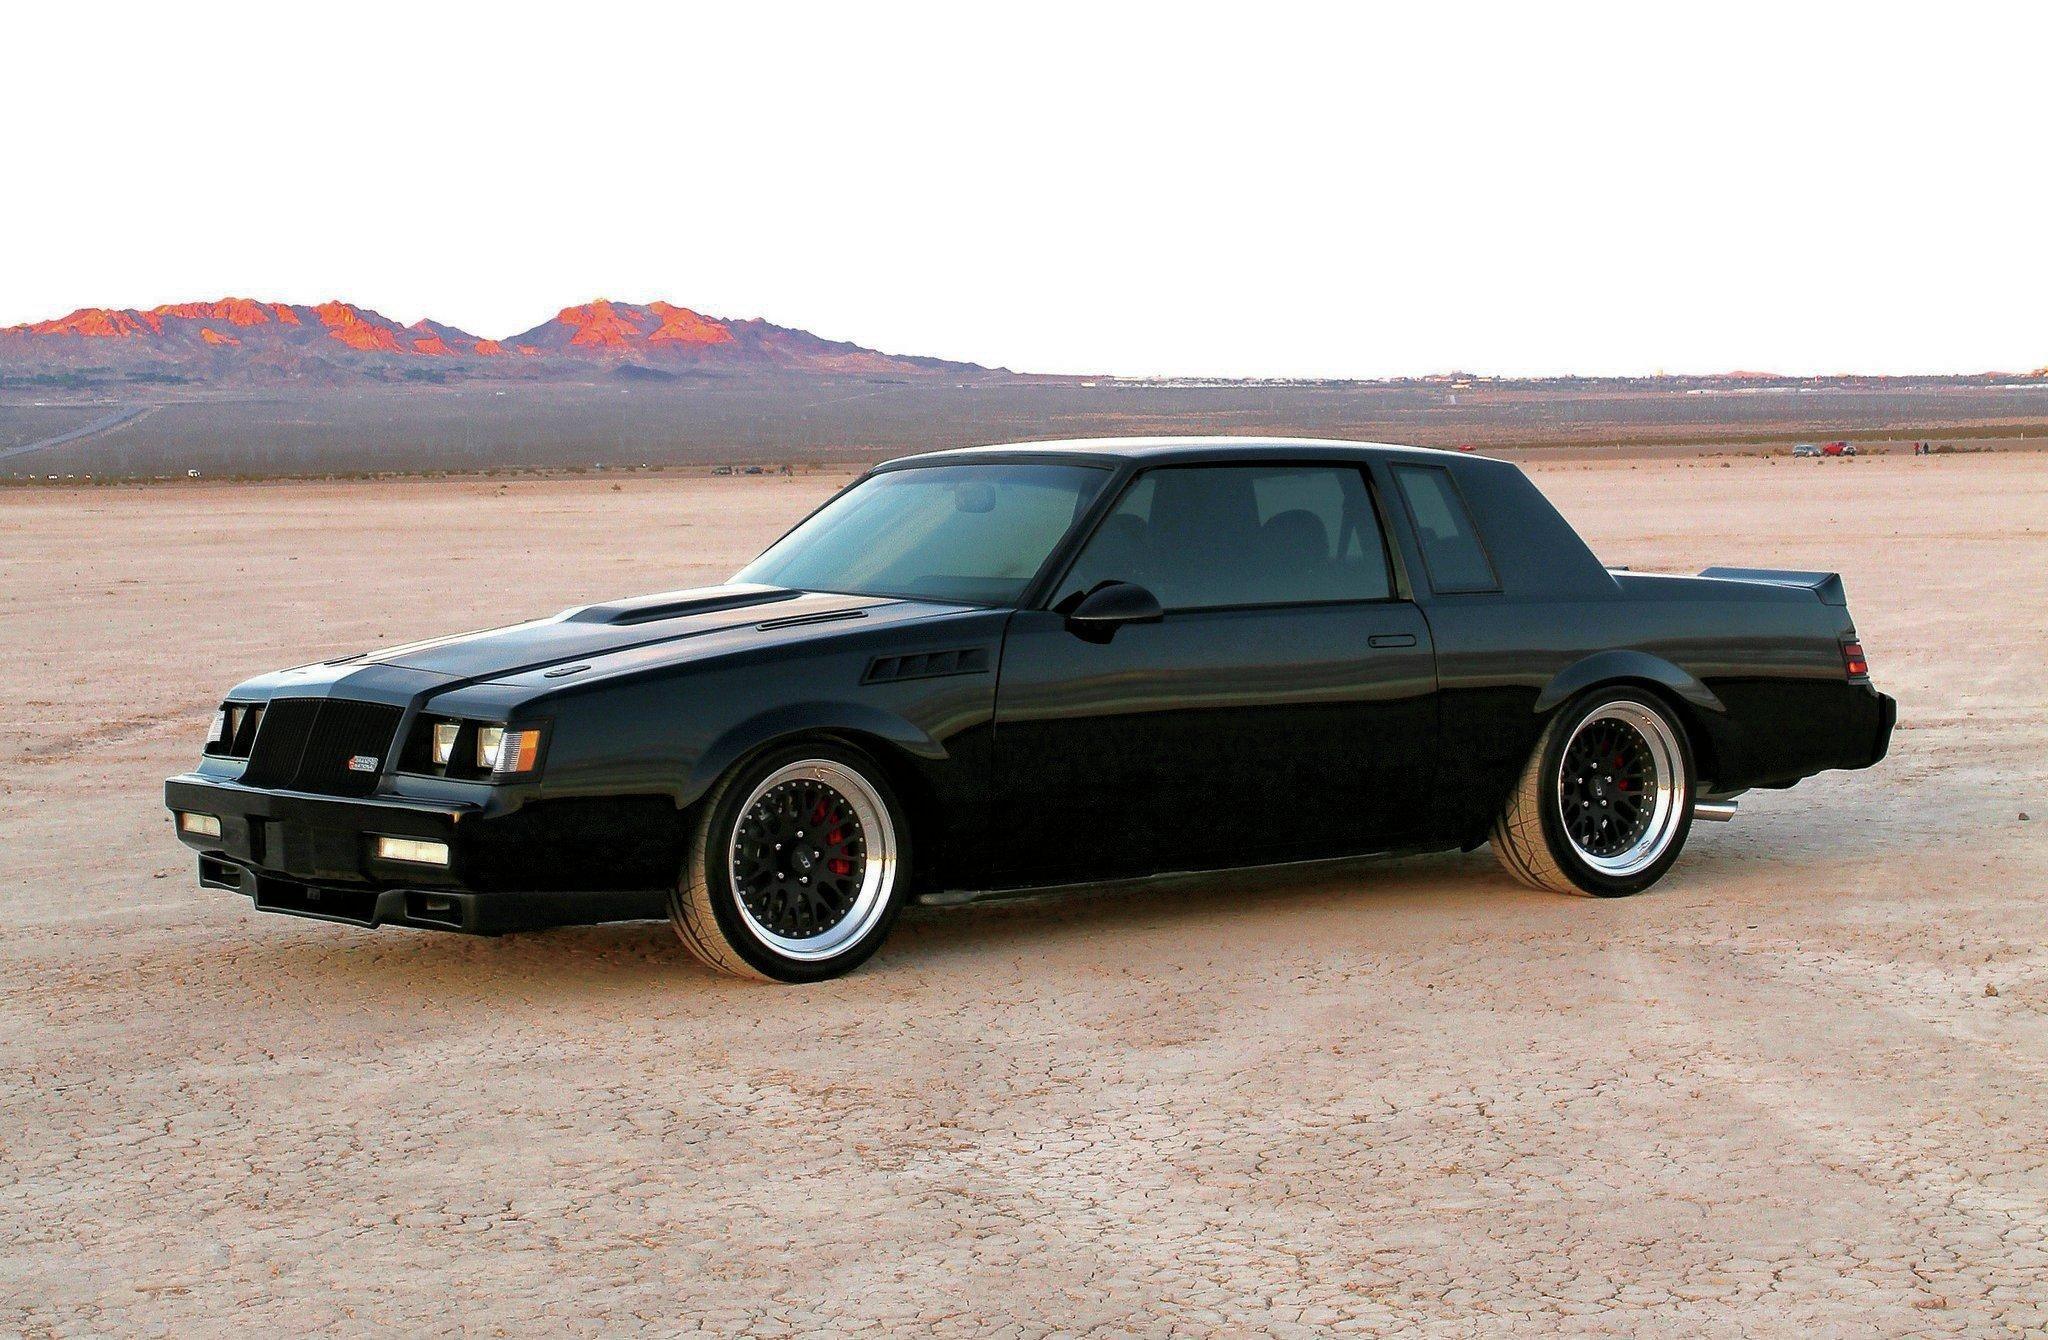 1987 Grand National Imgur Buick Grand National 1987 Buick Grand National Buick Grand National Gnx